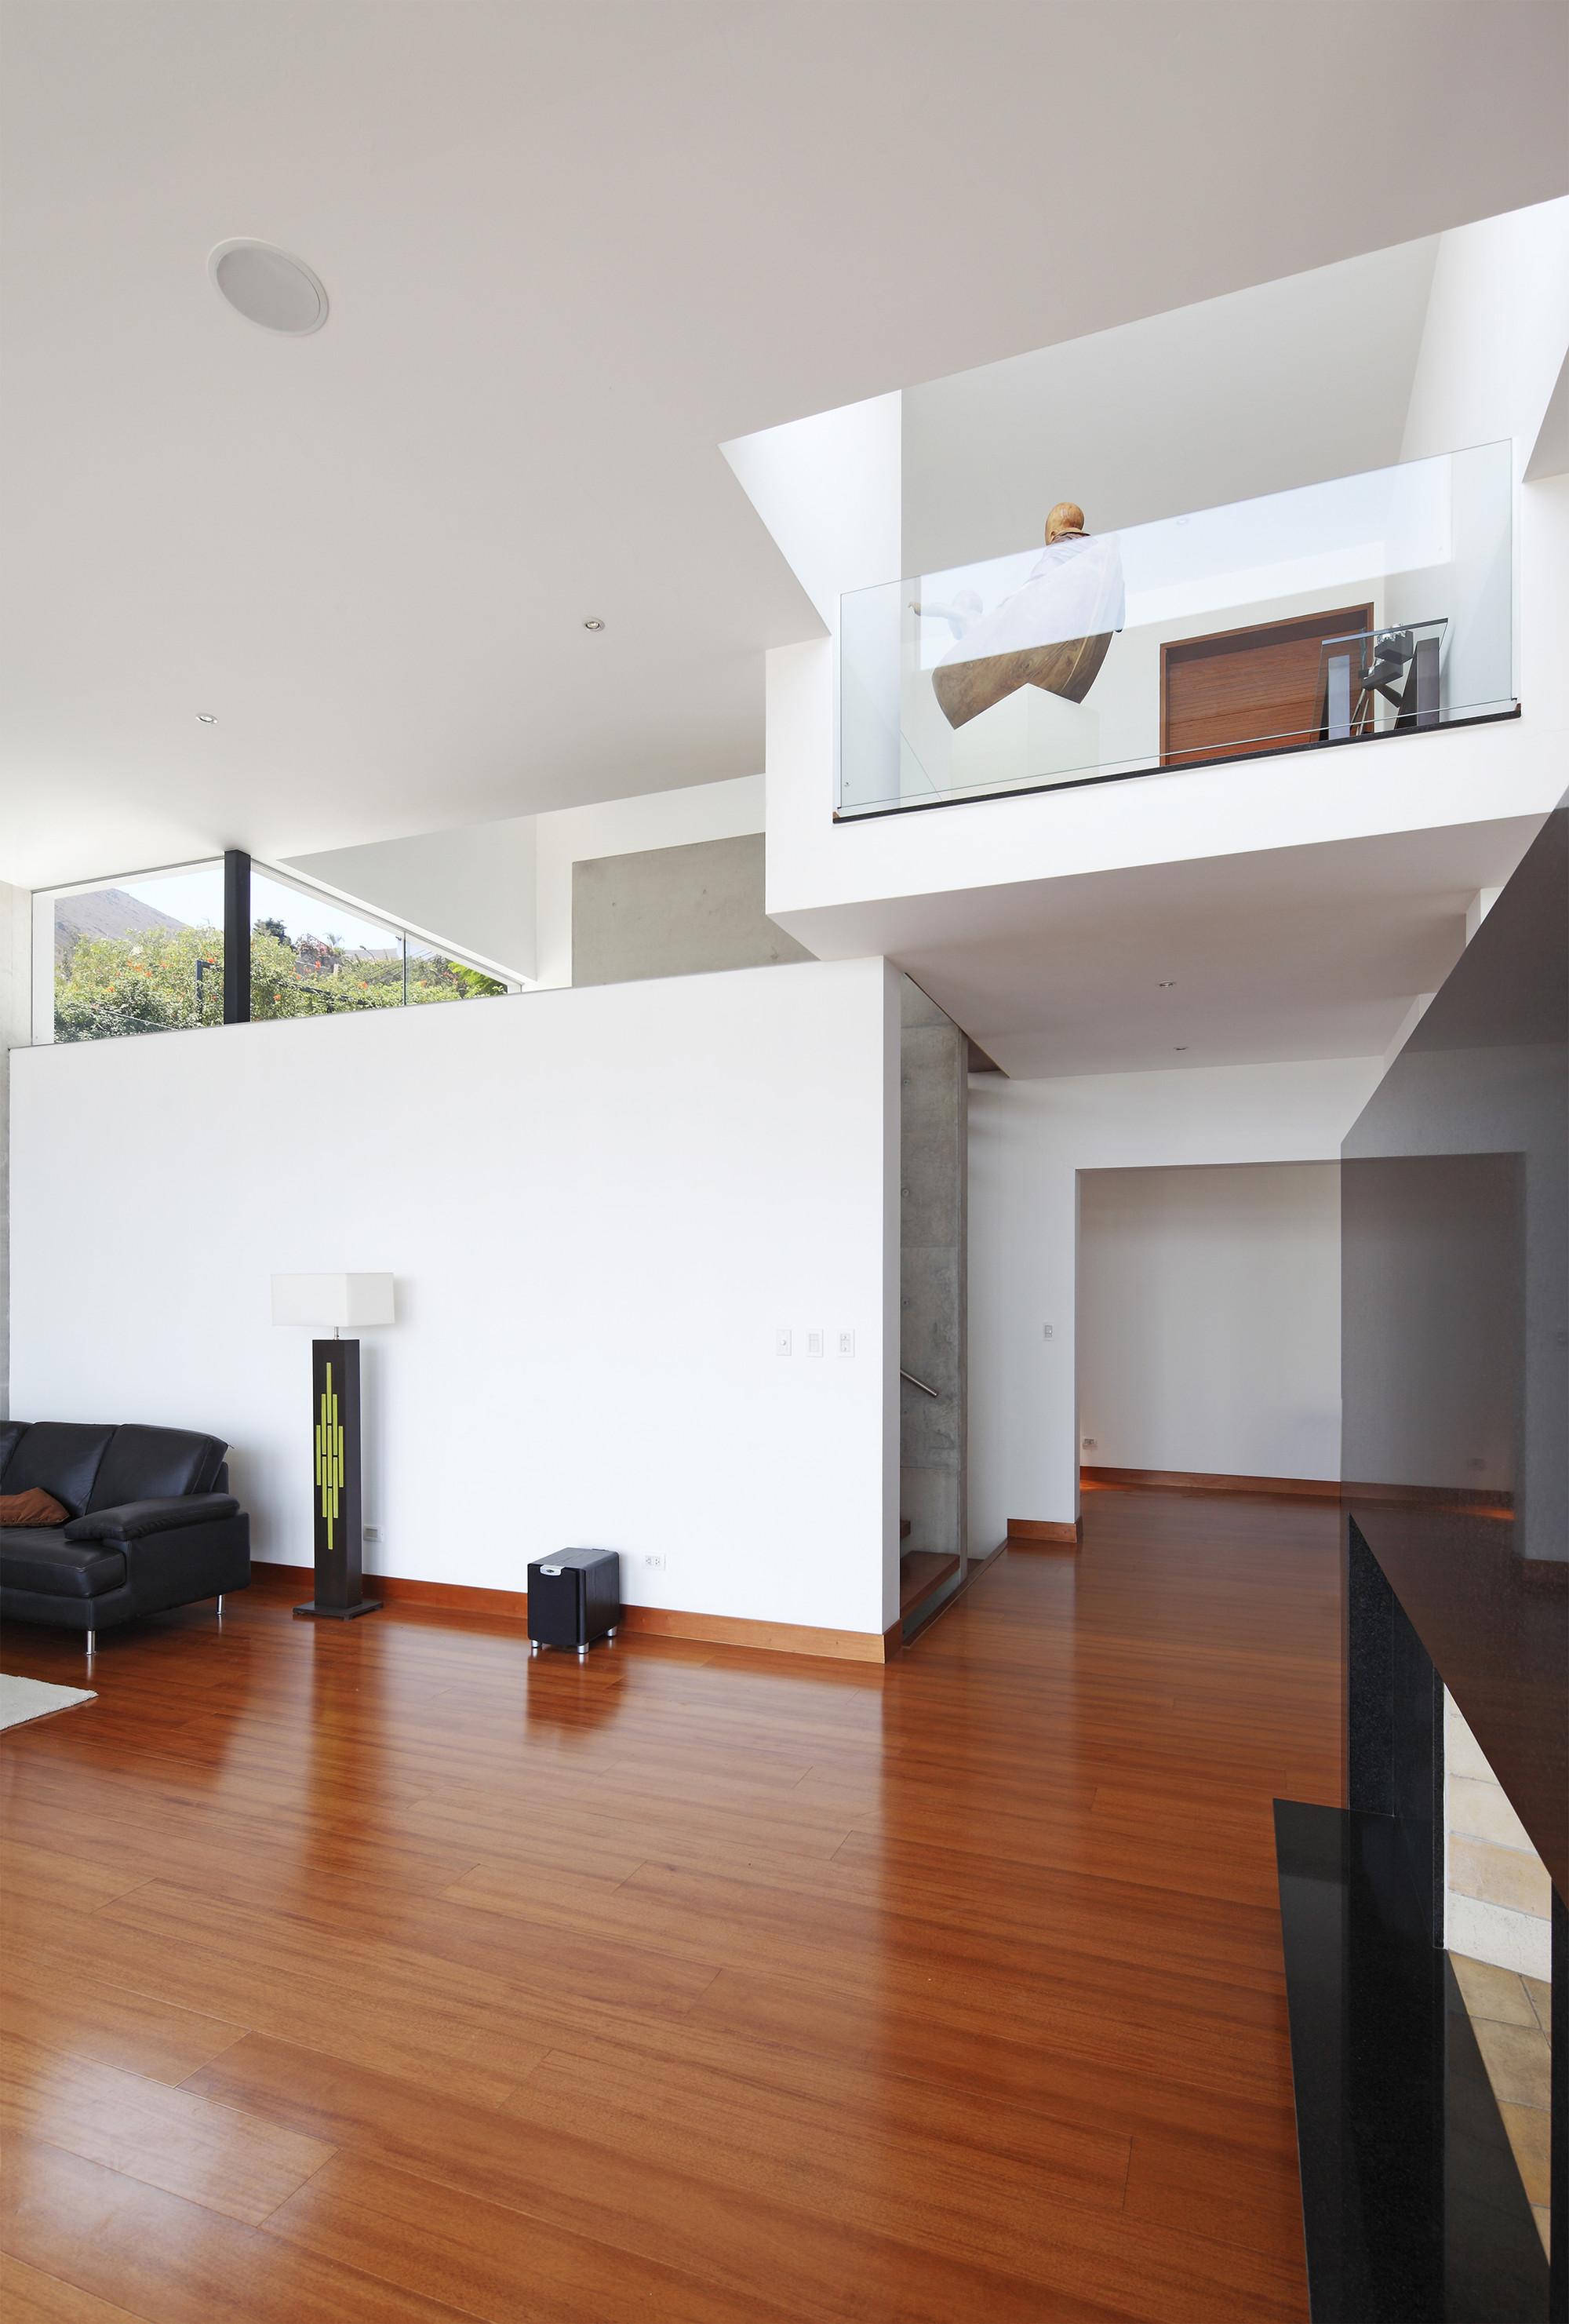 Galeria de casa b domenack arquitectos 8 for Casa de arquitectos